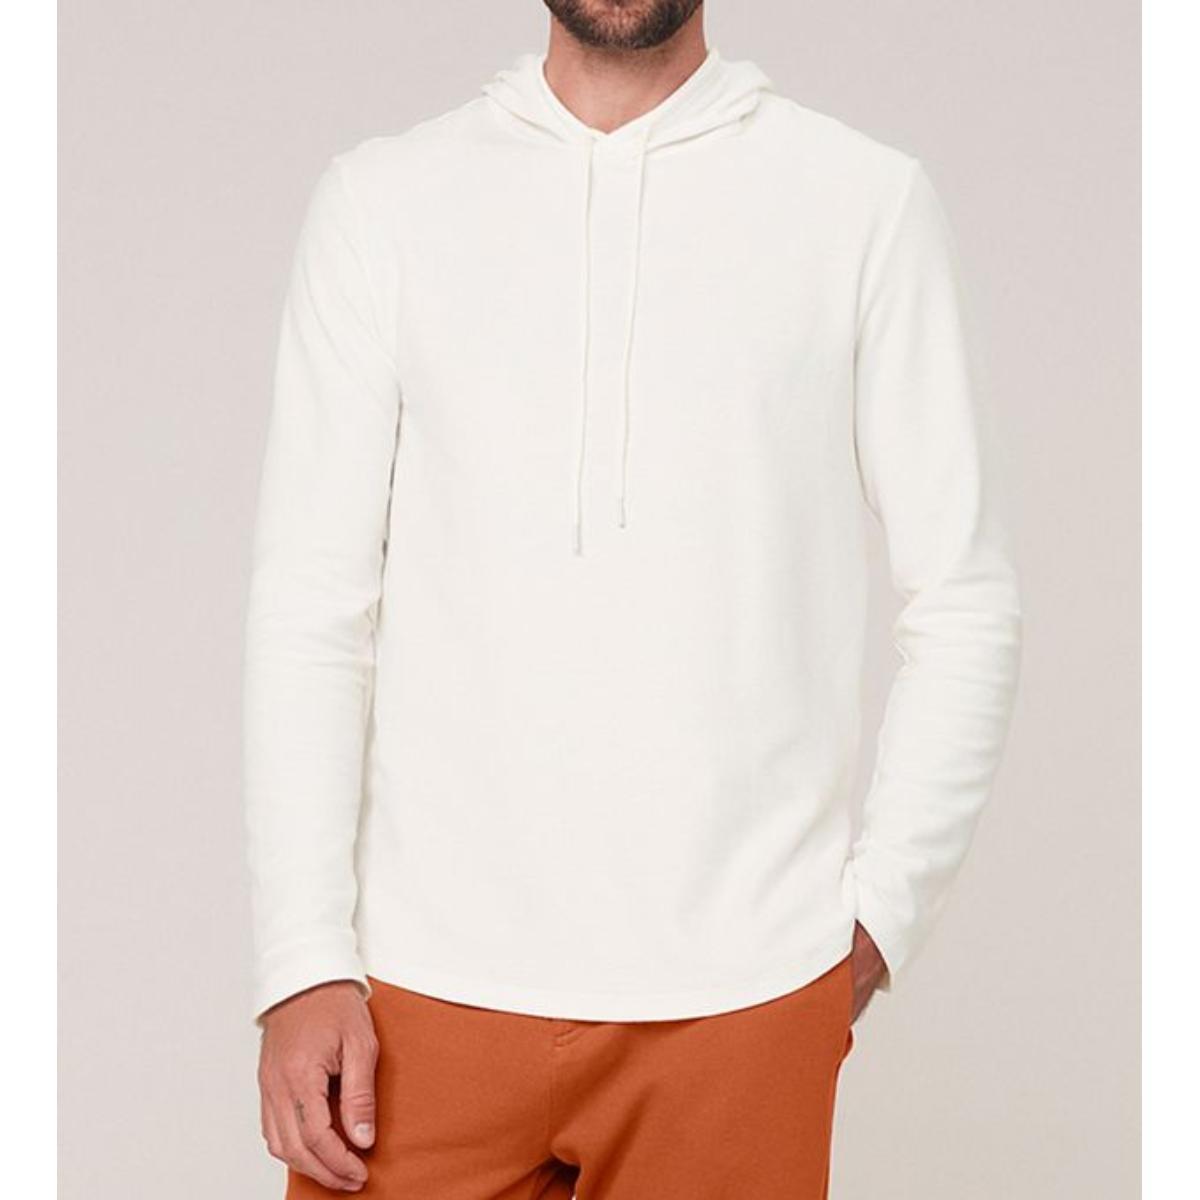 Camiseta Masculina Dzarm 6kgy Nmcen Branco